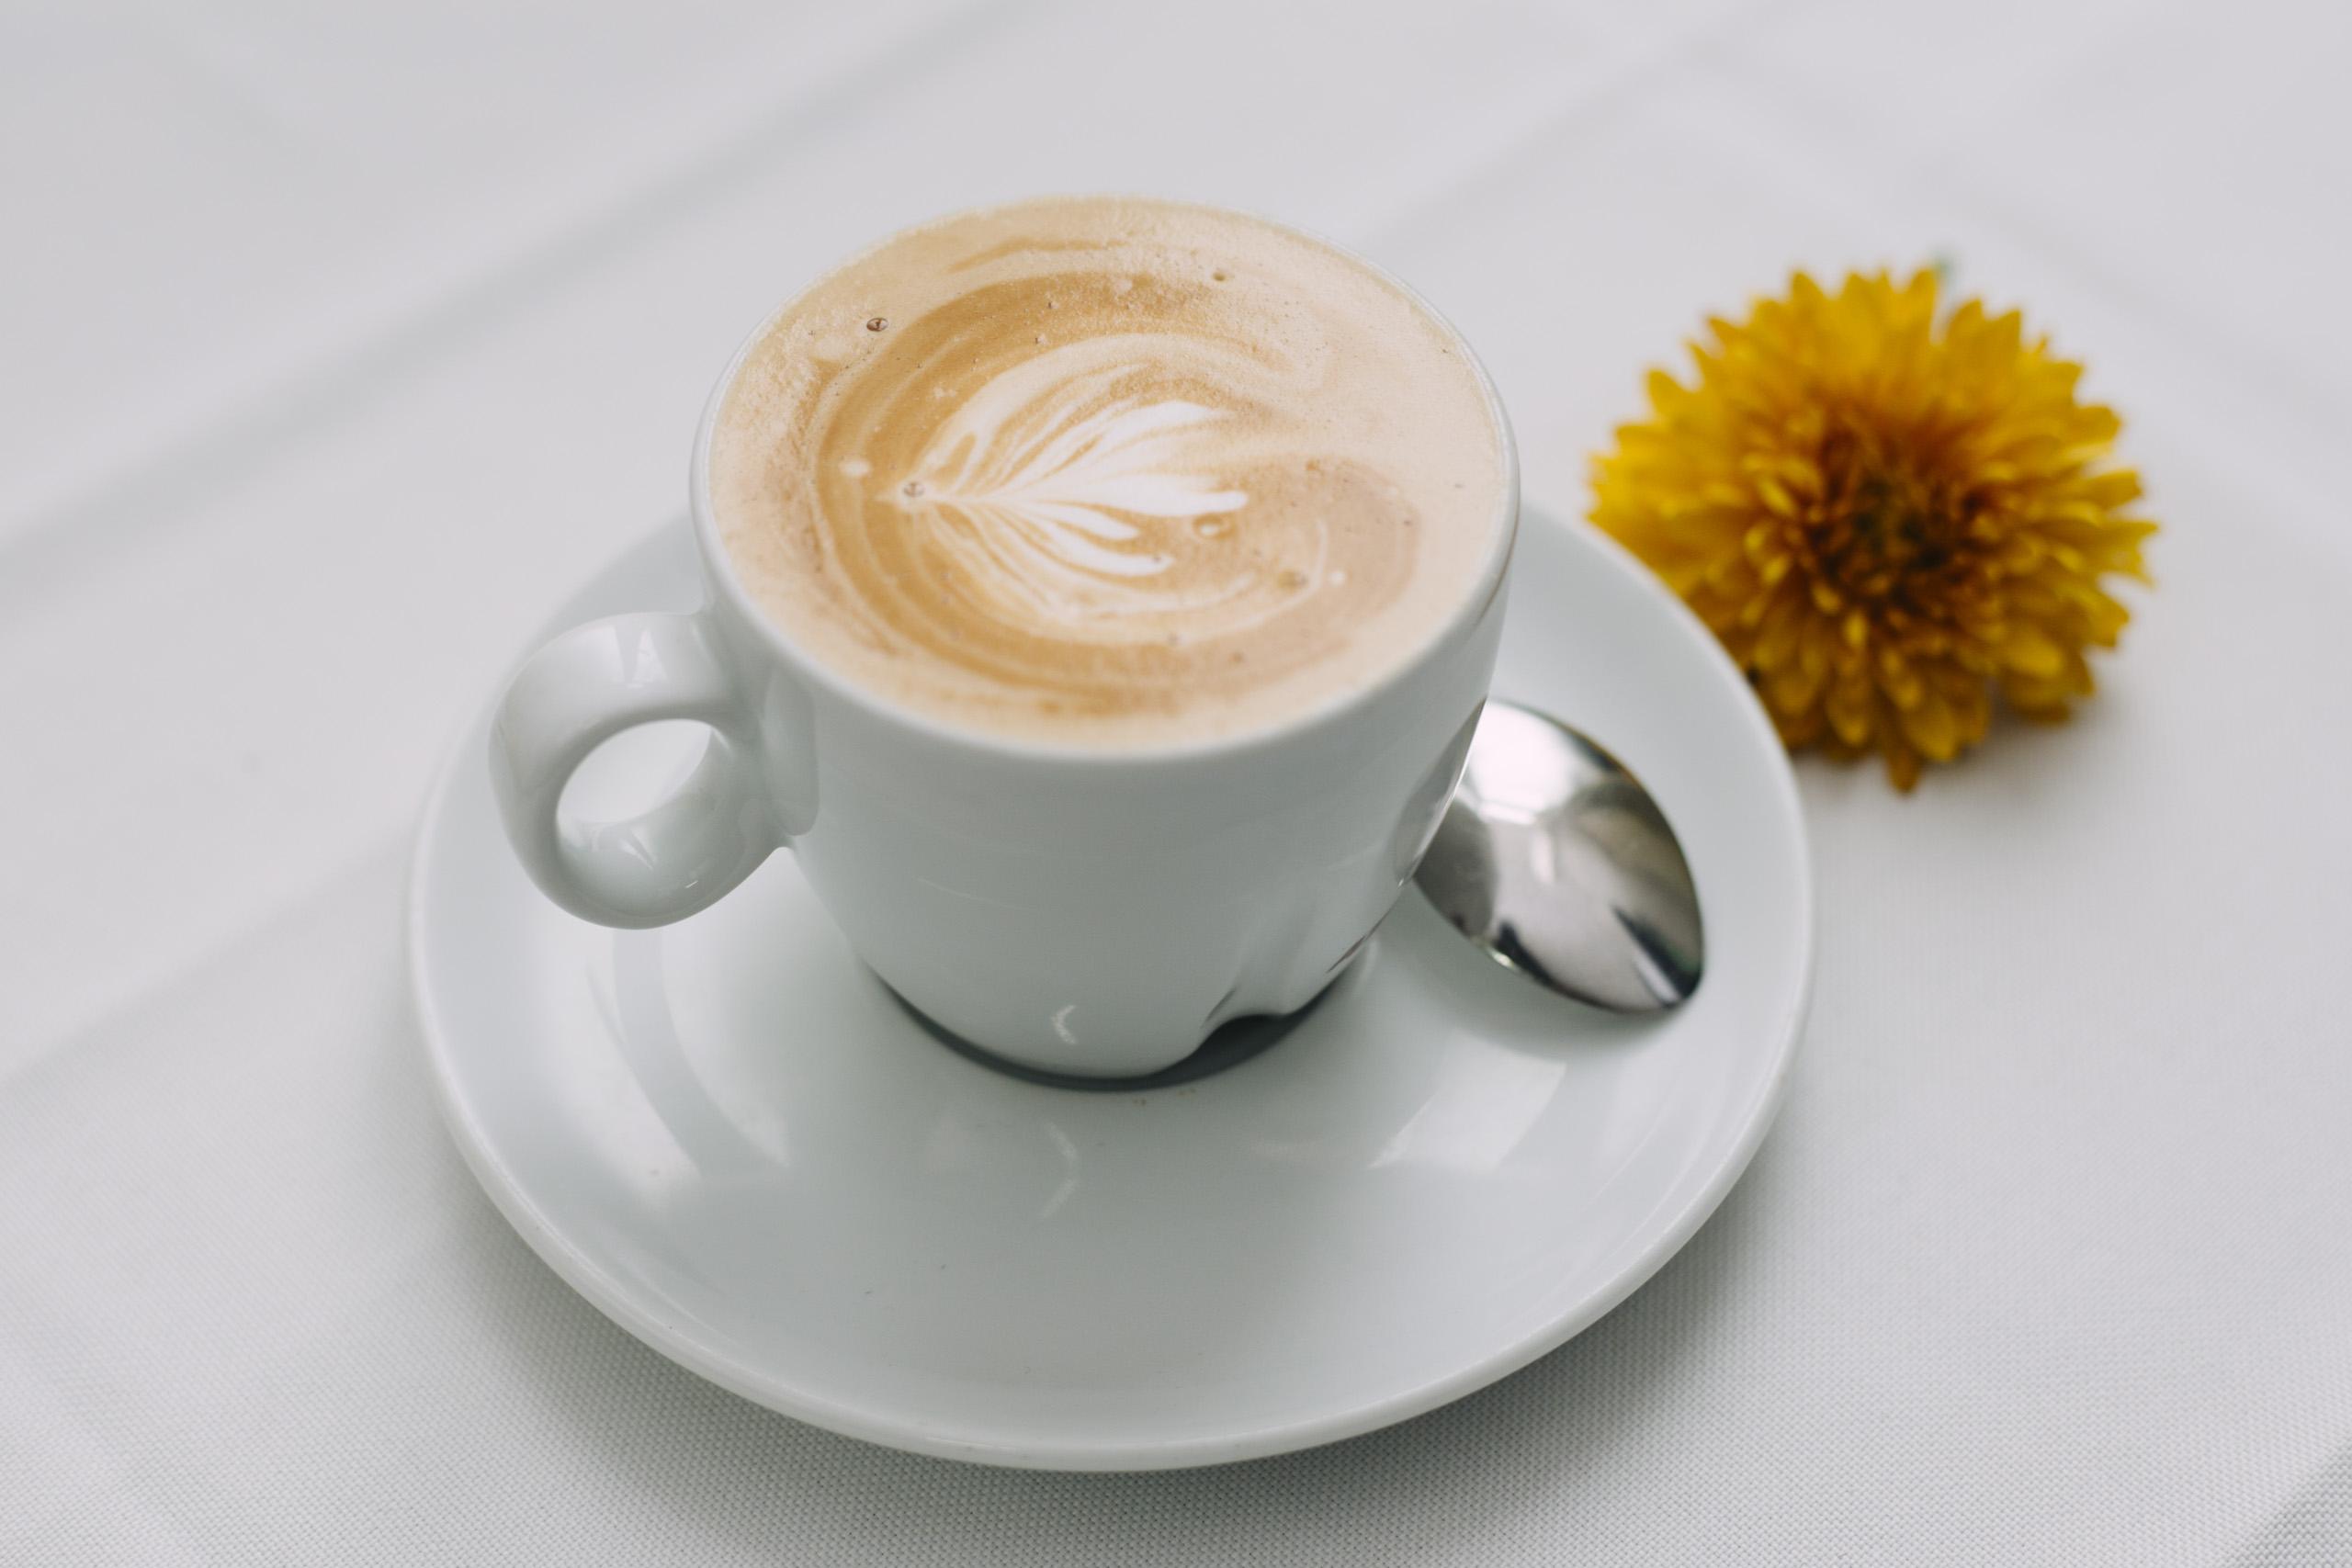 Heißer leckerer Kaffee